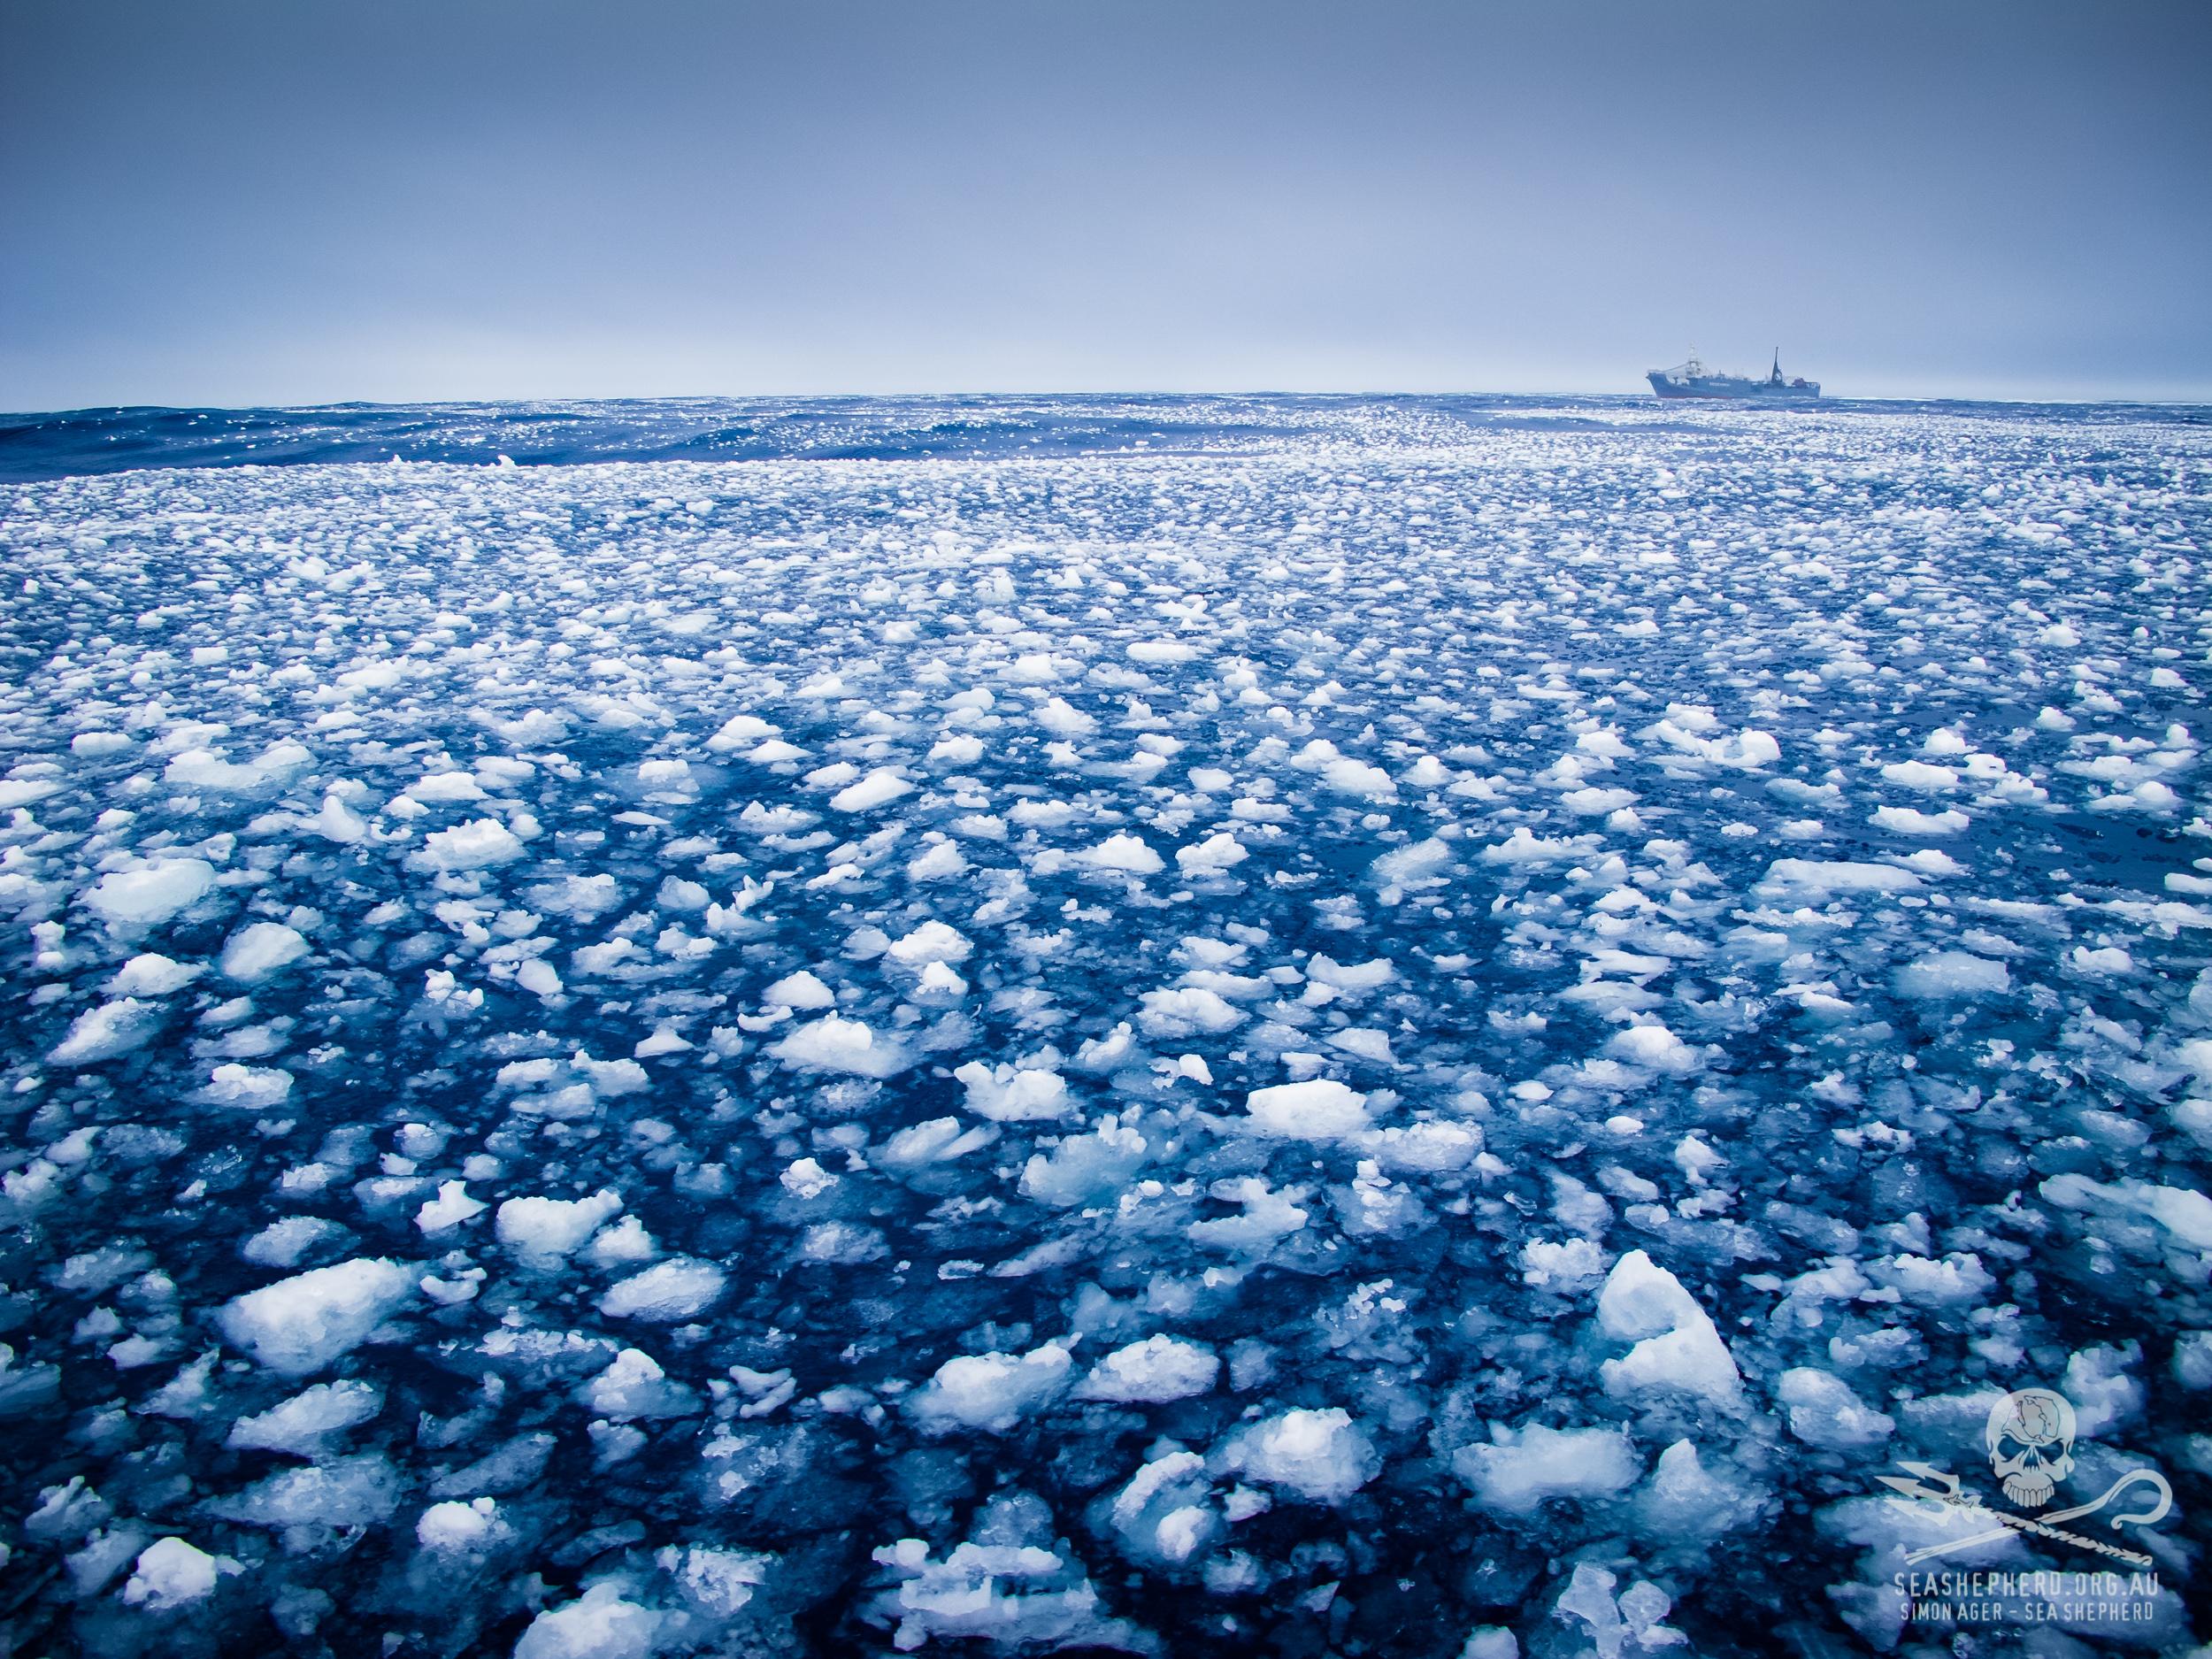 130130-SA-002-YM3-3-miles-from-Bardot-navigating-ice.jpg